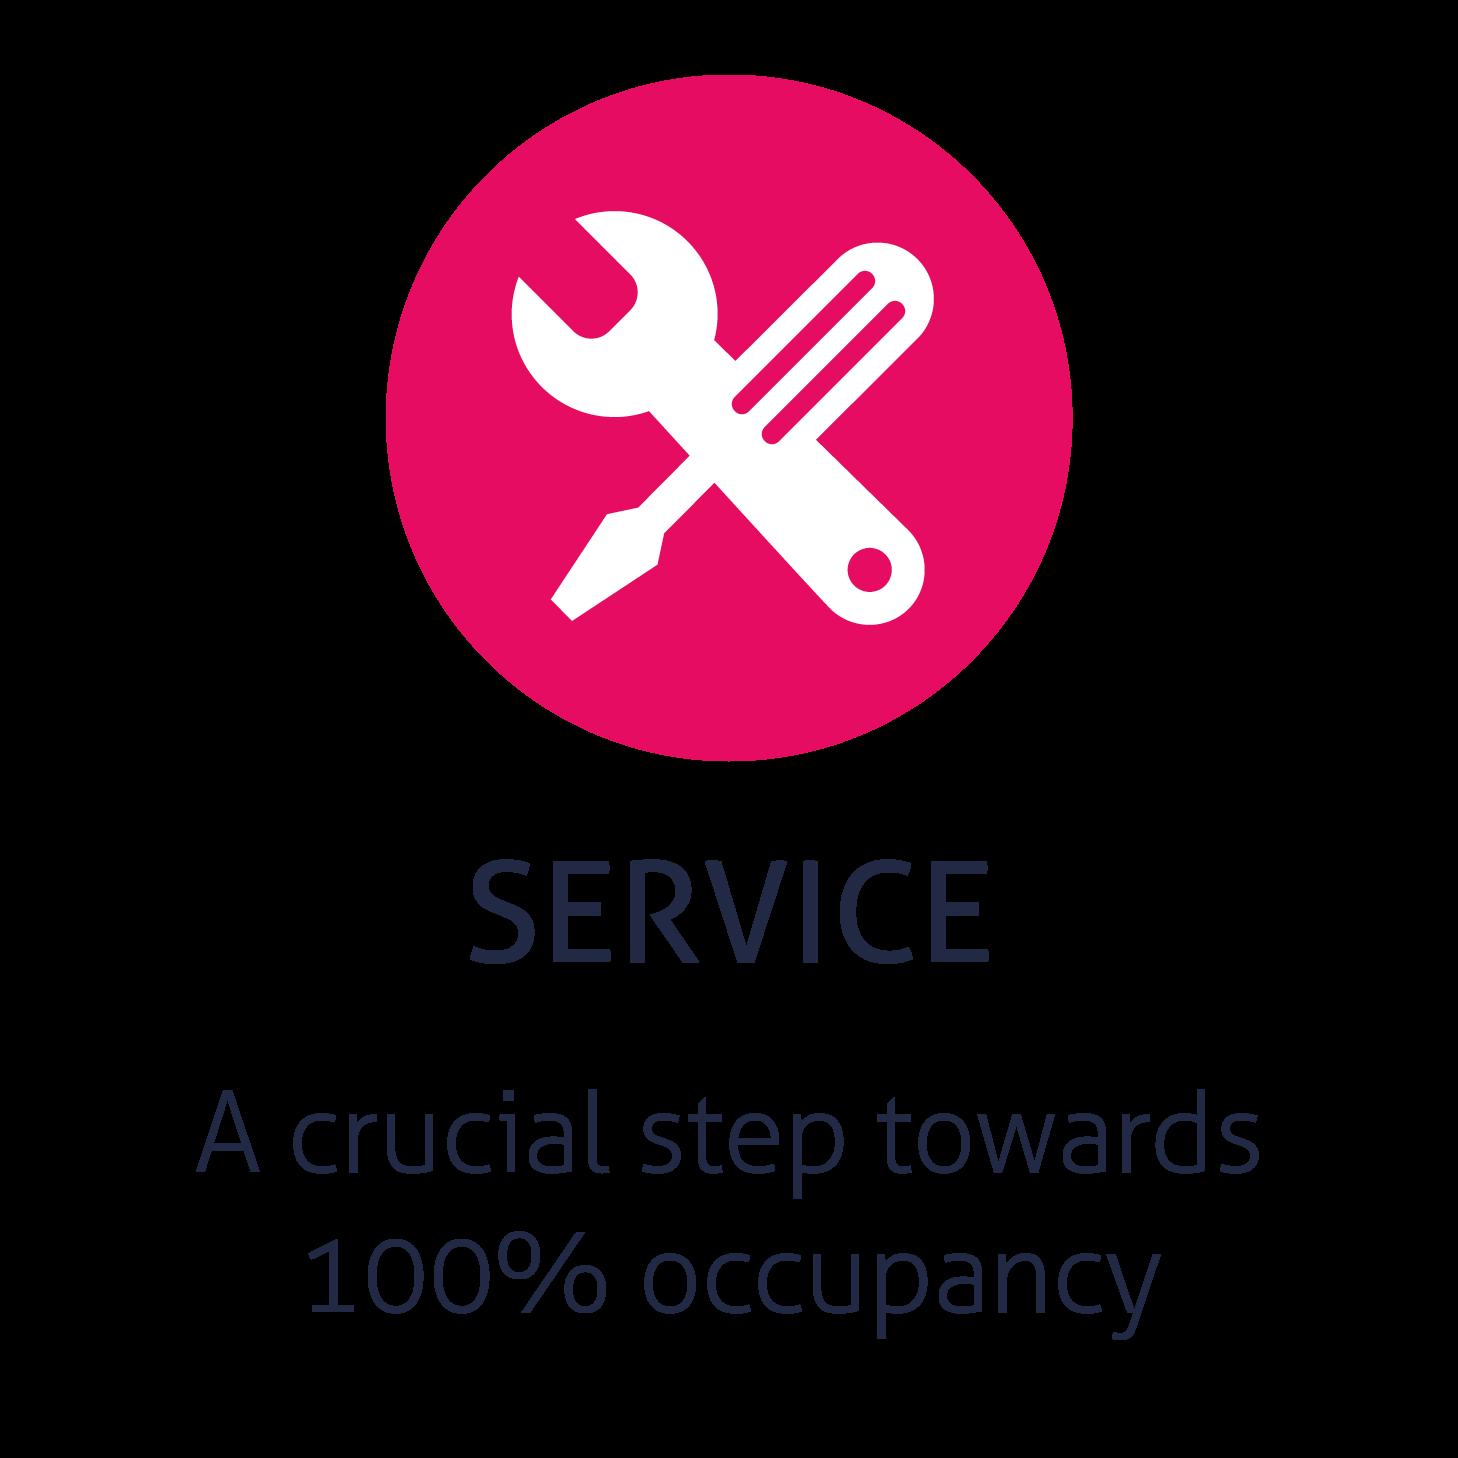 A crucial step towards 100% occupancy